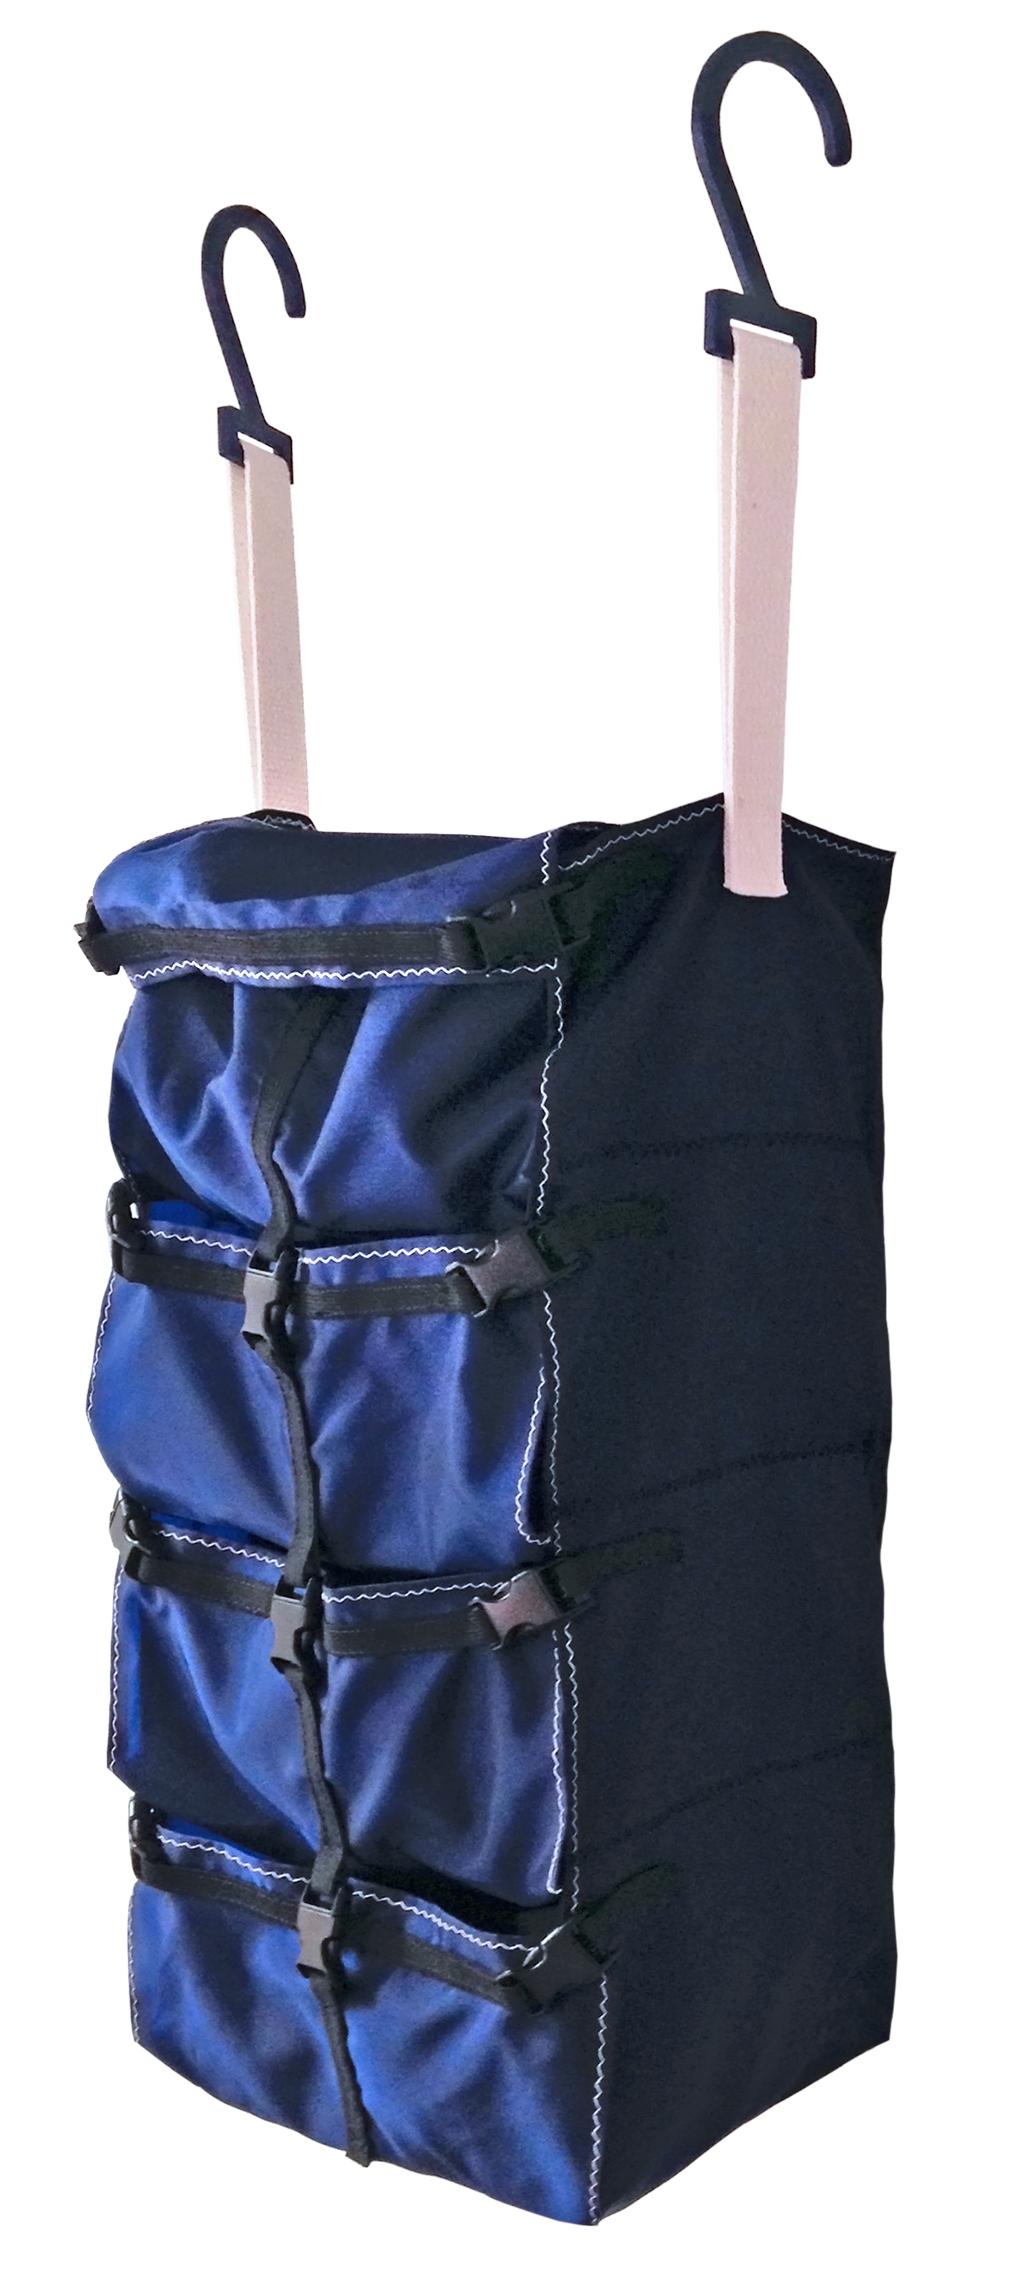 PNG Unpack Backpack - 80604